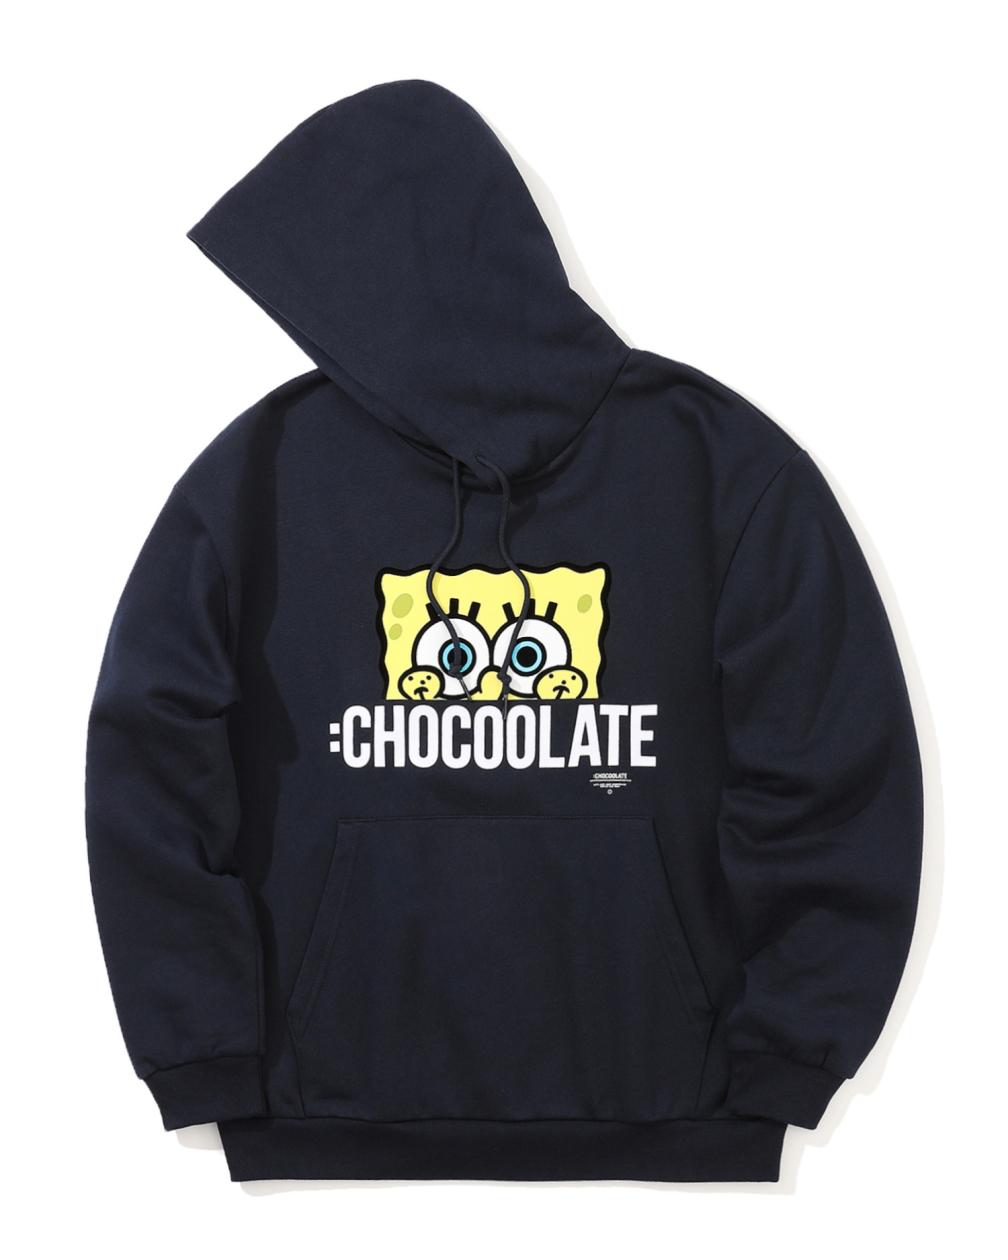 Chocolatte Spongebob Hoodie SR01